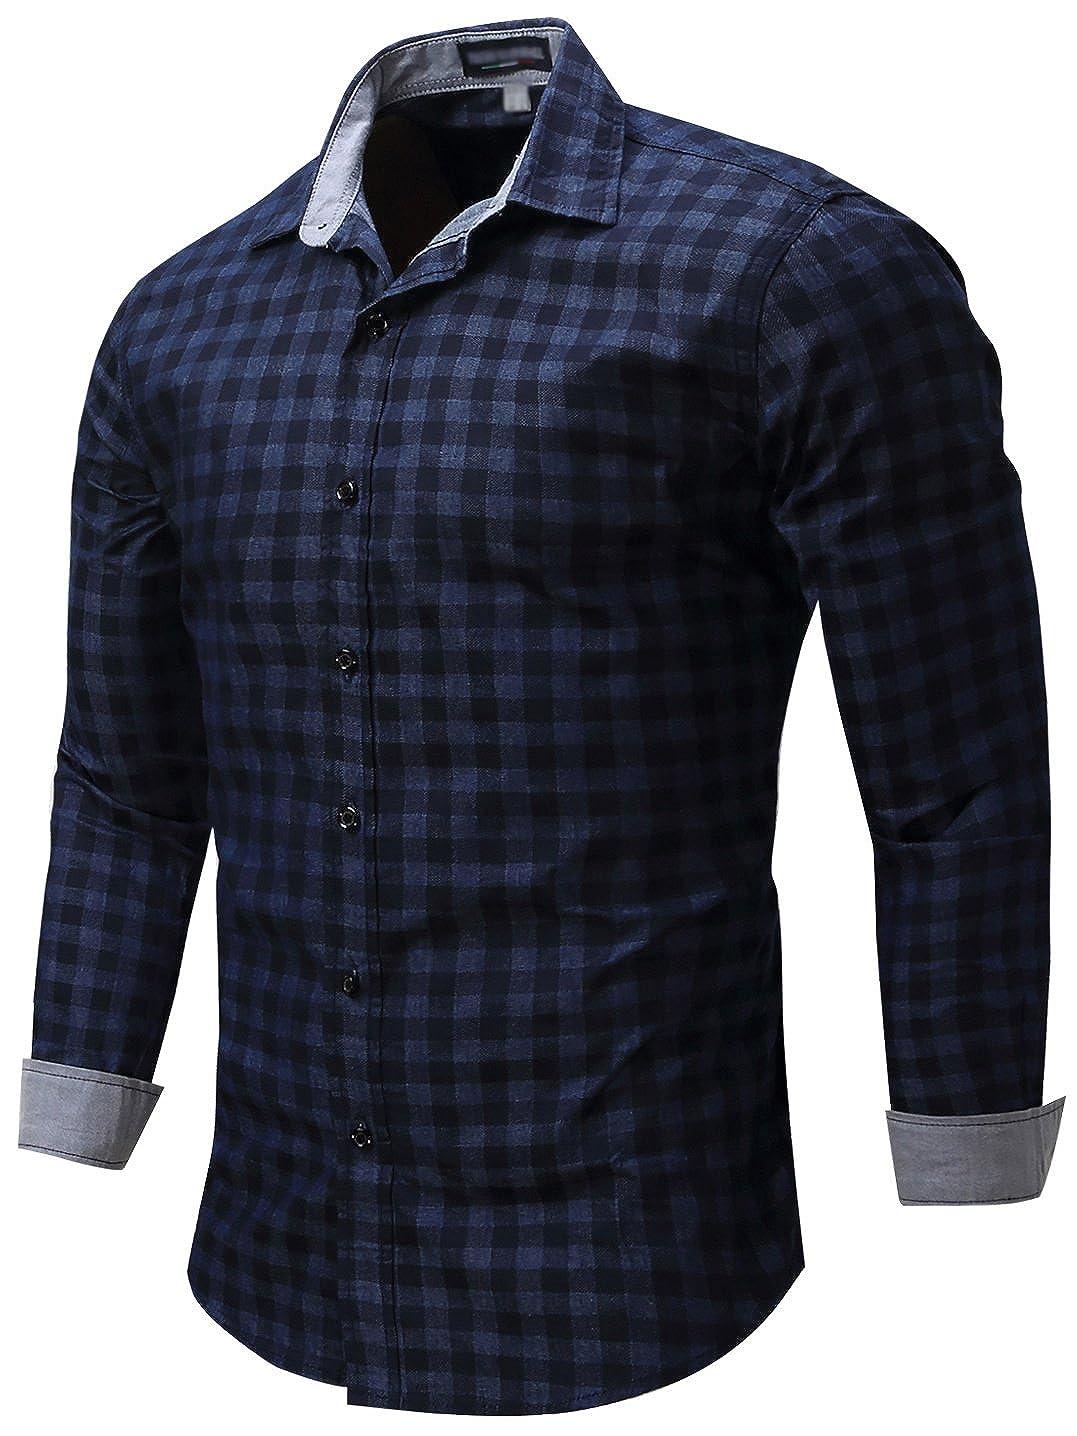 Neleus Men's Stand Collar Slim Fit Lightweight Varsity Baseball Jacket DT0205